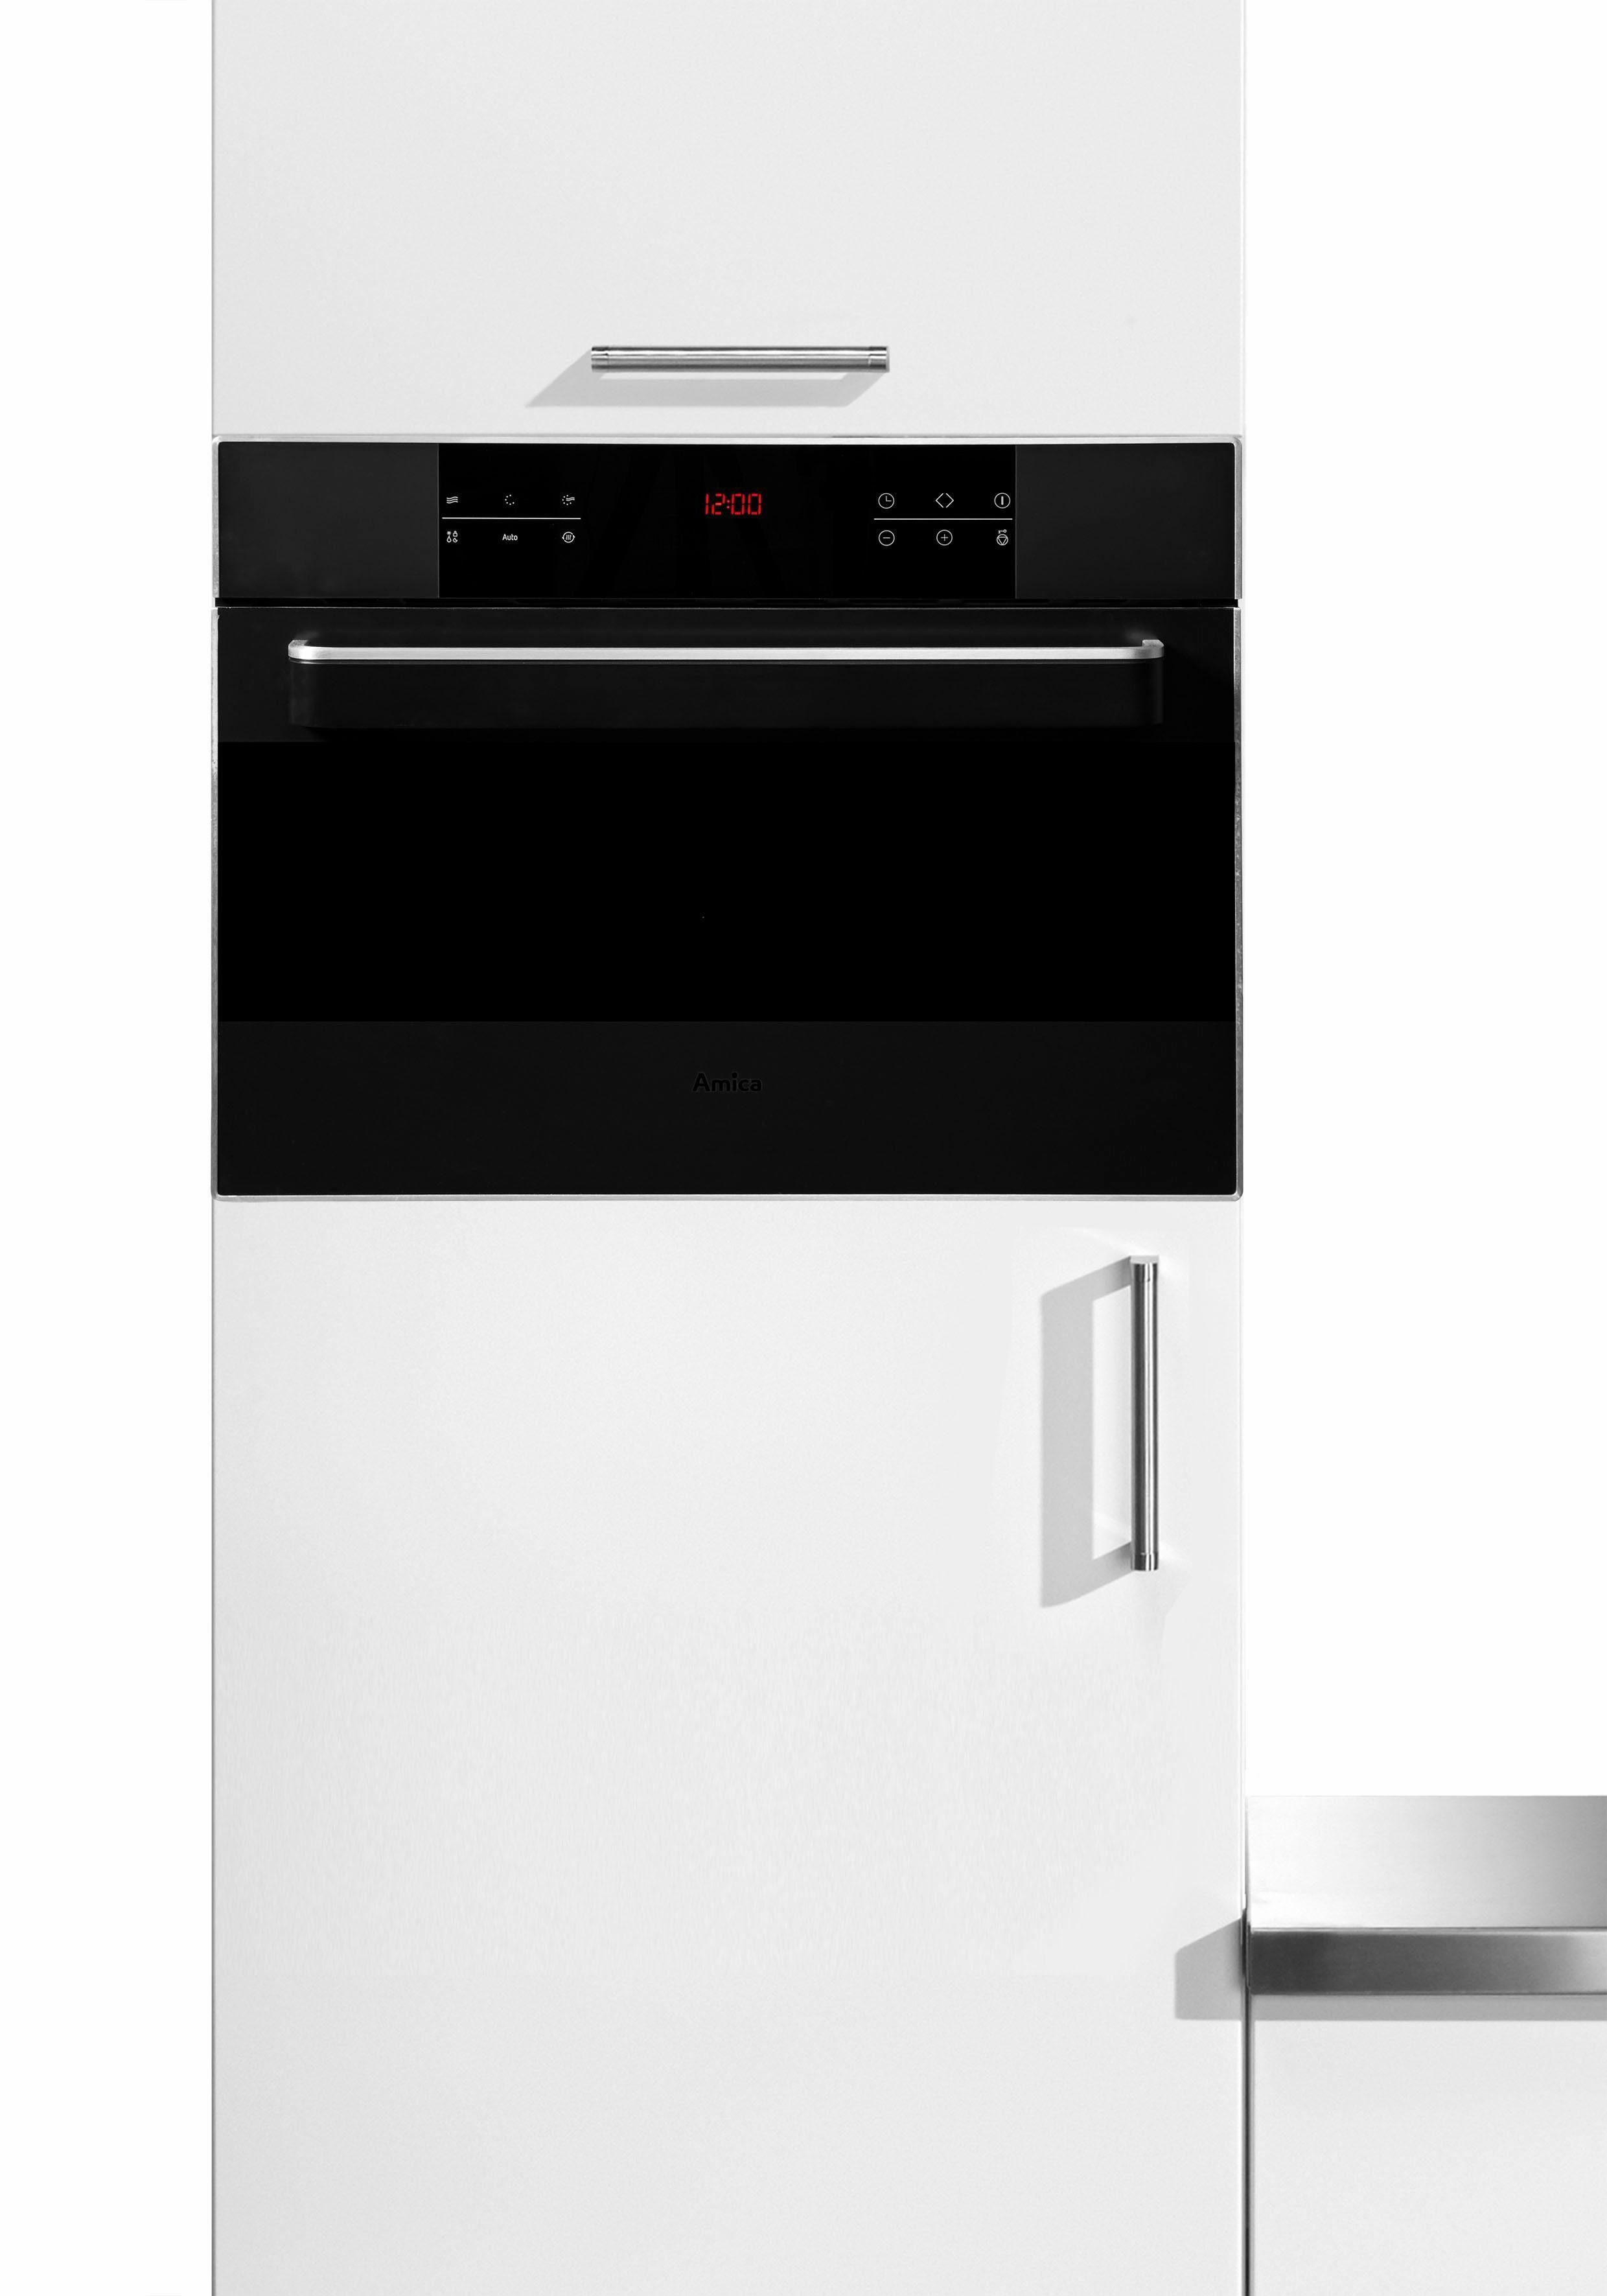 Amica Kompakt-Einbaubackofen EBC 63401 S, mit Mikrowellenfunktion